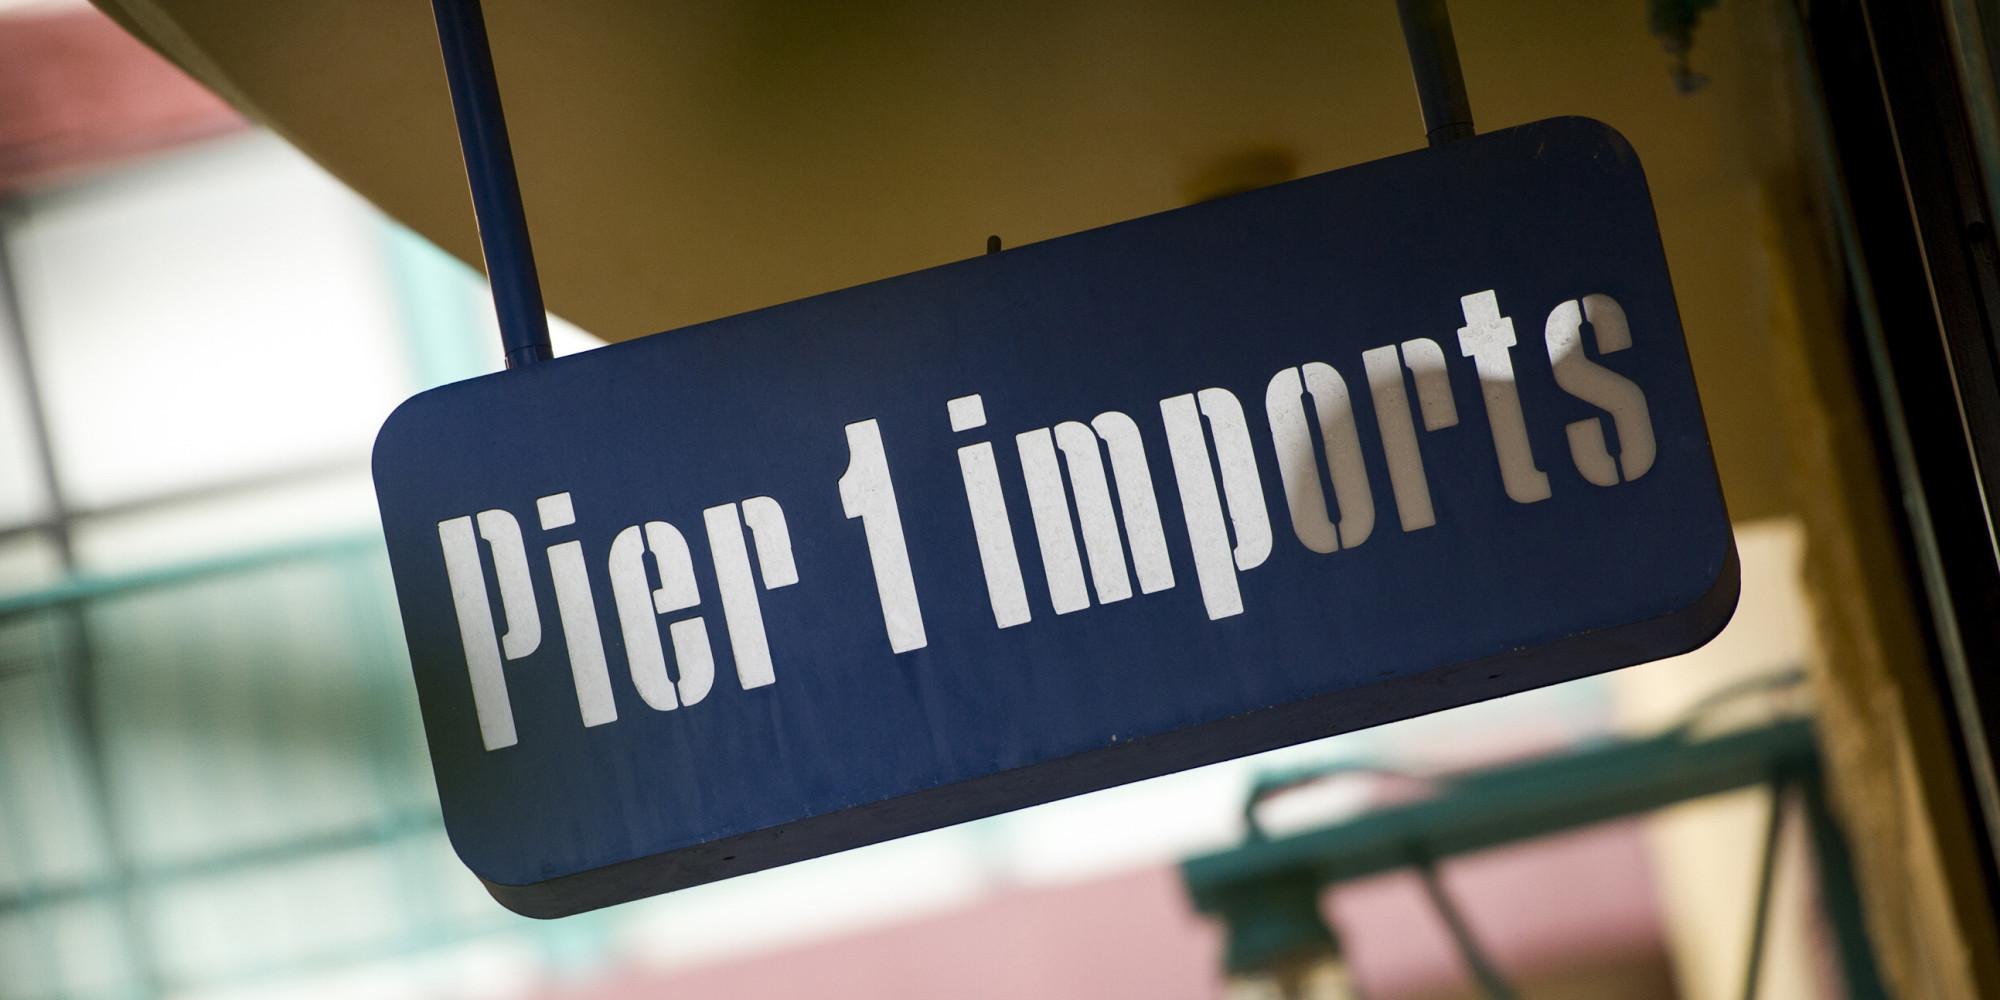 Amazoncom PIER 1 IMPORTS